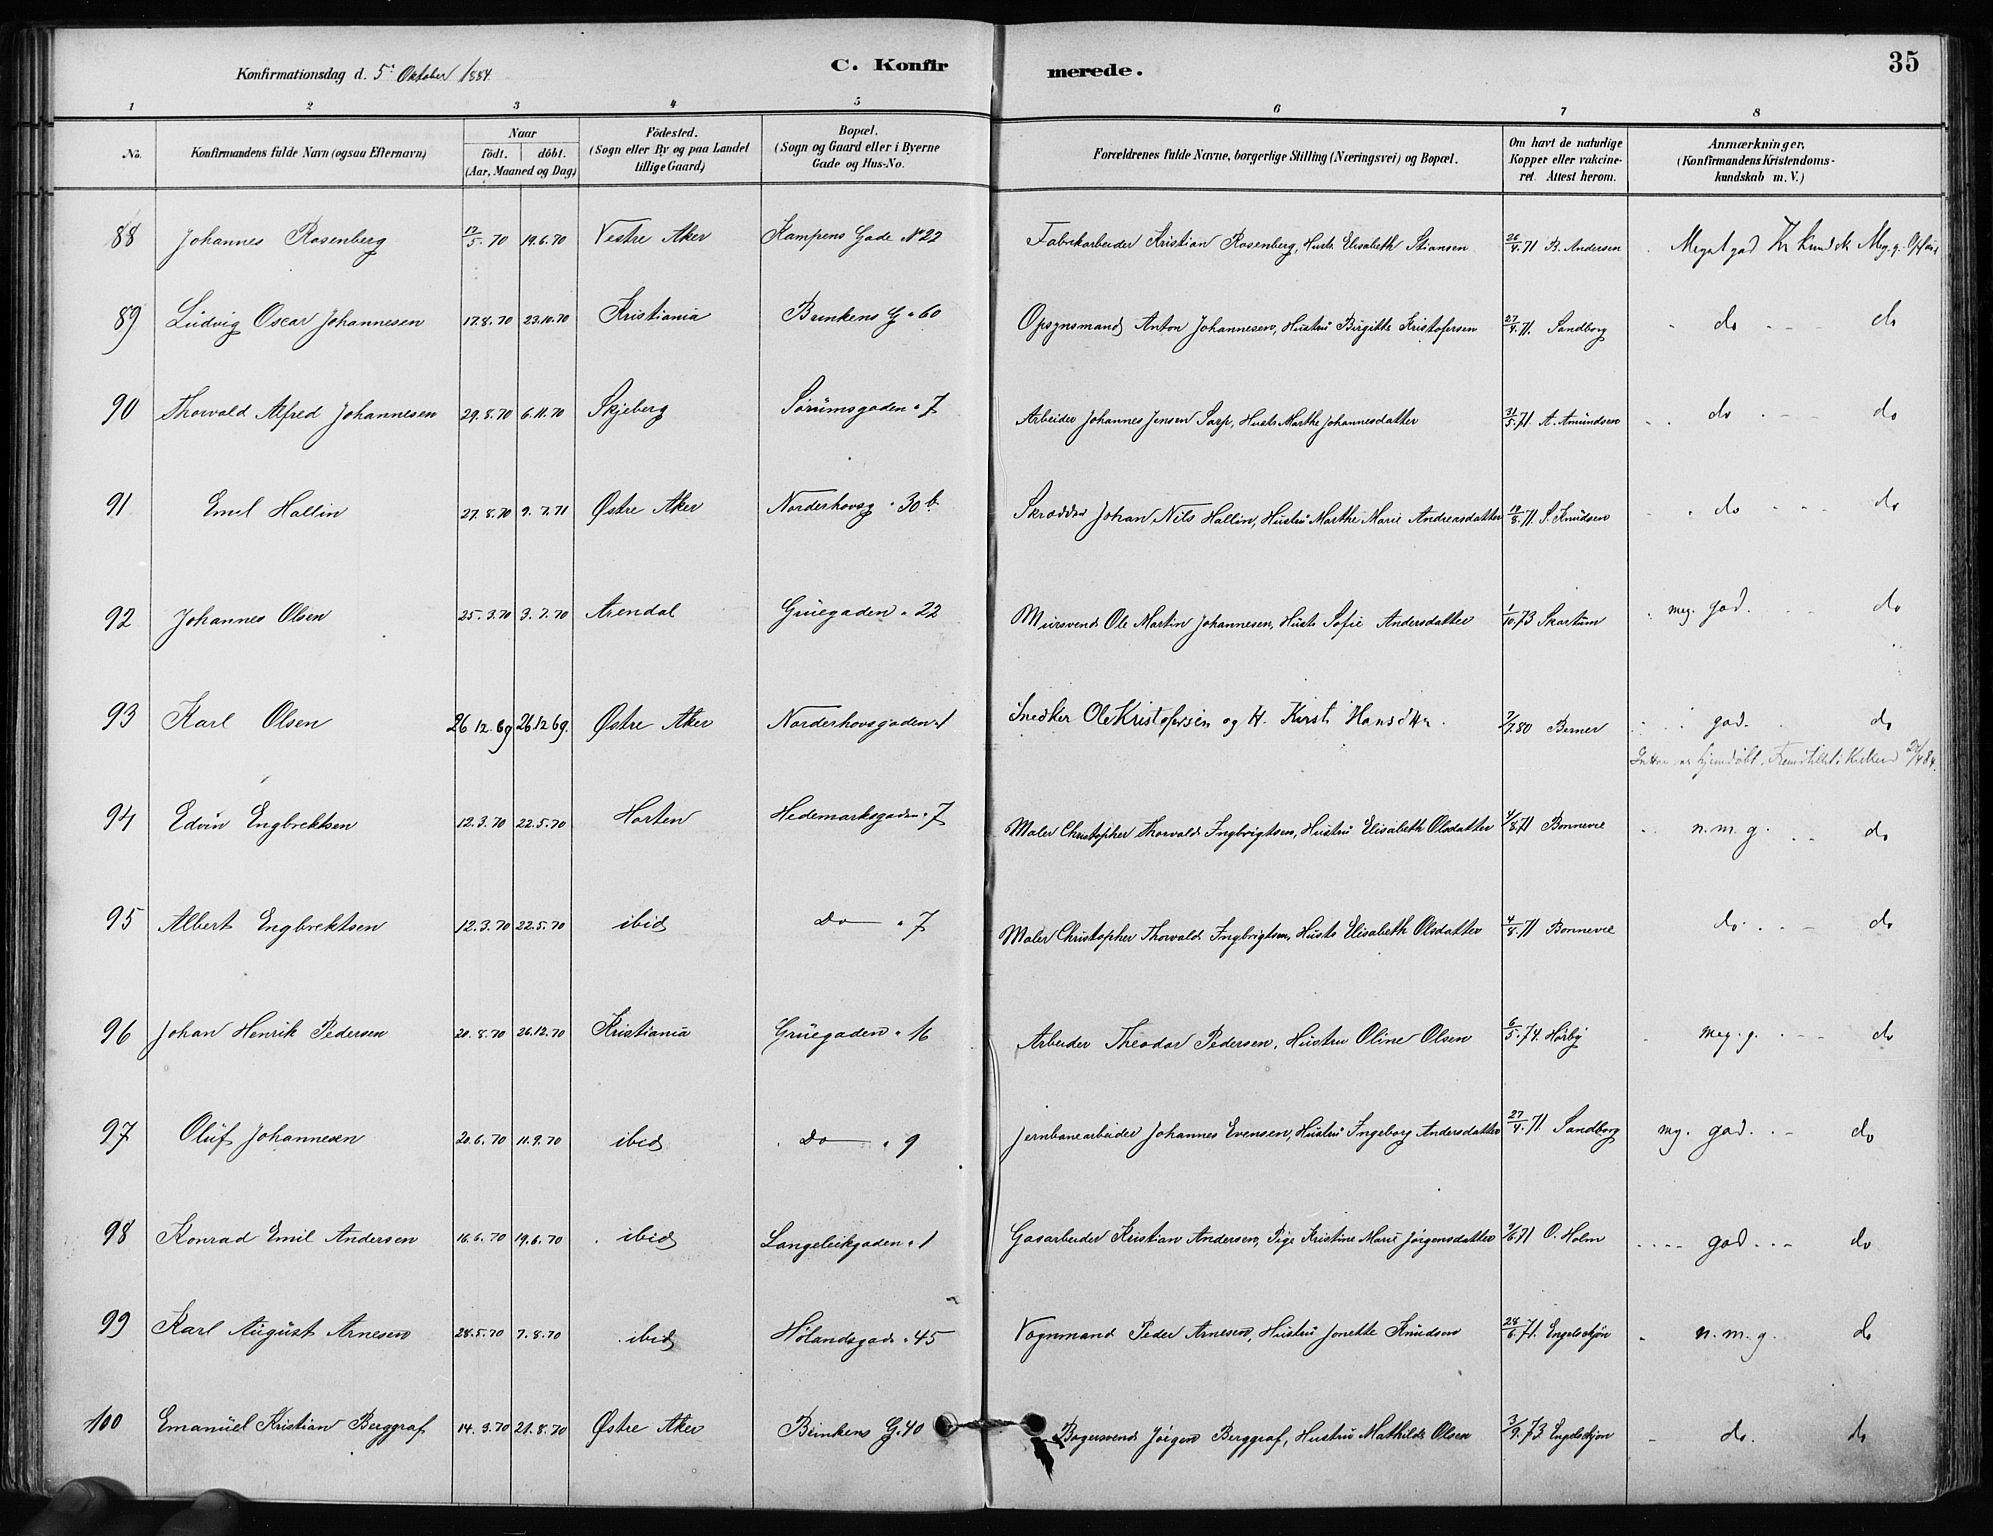 SAO, Kampen prestekontor Kirkebøker, F/Fa/L0002: Ministerialbok nr. I 2, 1880-1888, s. 35